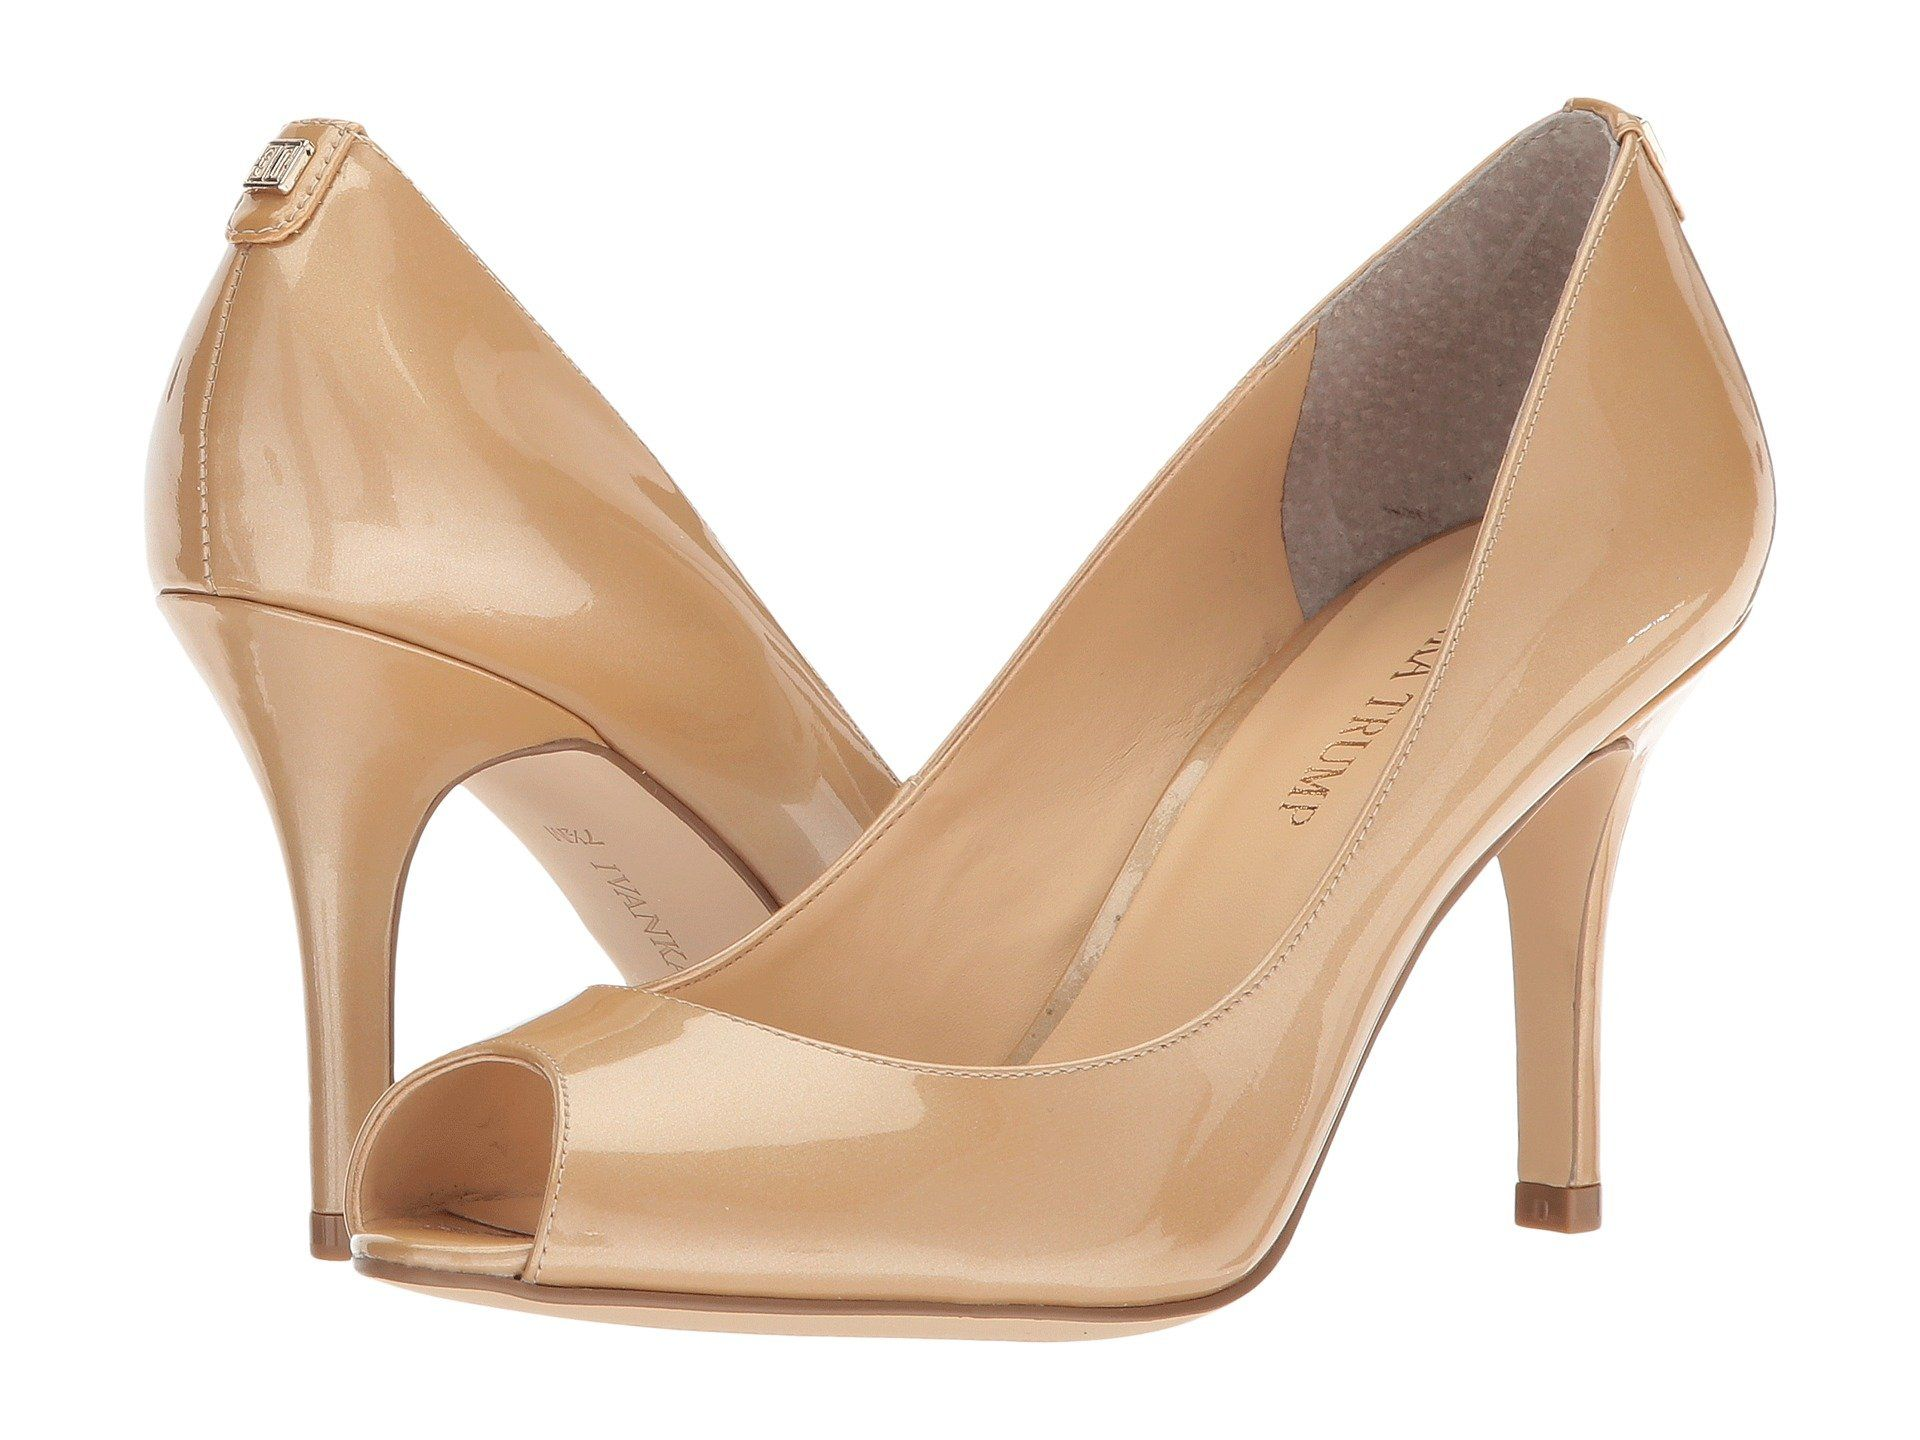 IVANKA TRUMP | Ivanka Trump Cleo 5 #Shoes #Heels #IVANKA TRUMP